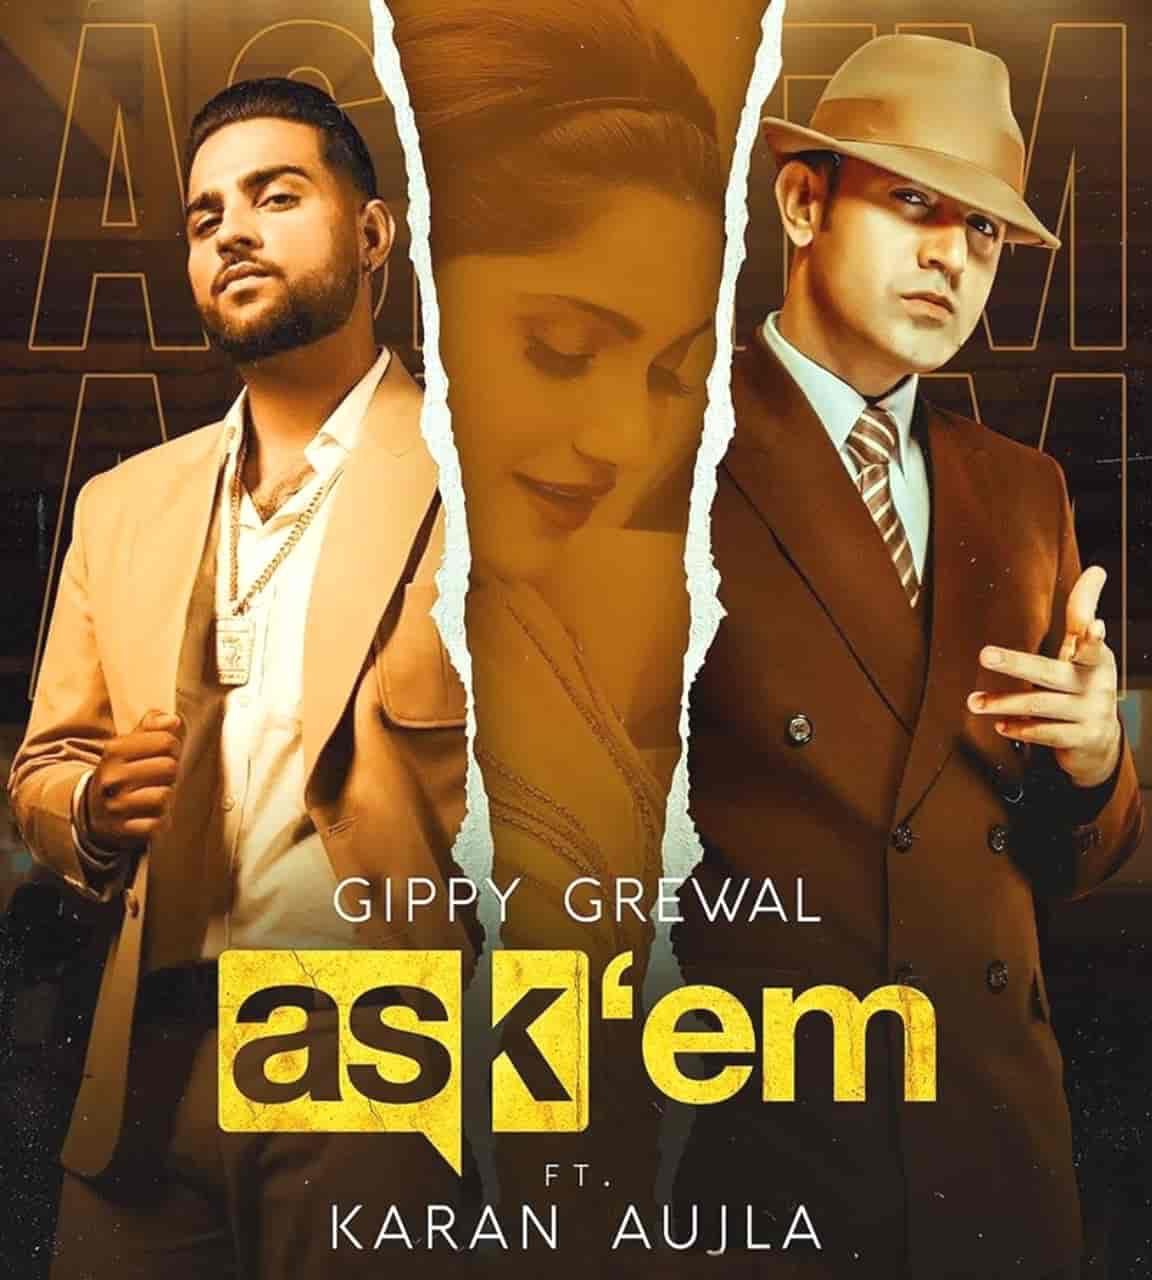 Ask Them Punjabi Song Image Features Gippy Grewal and Karan Aujla